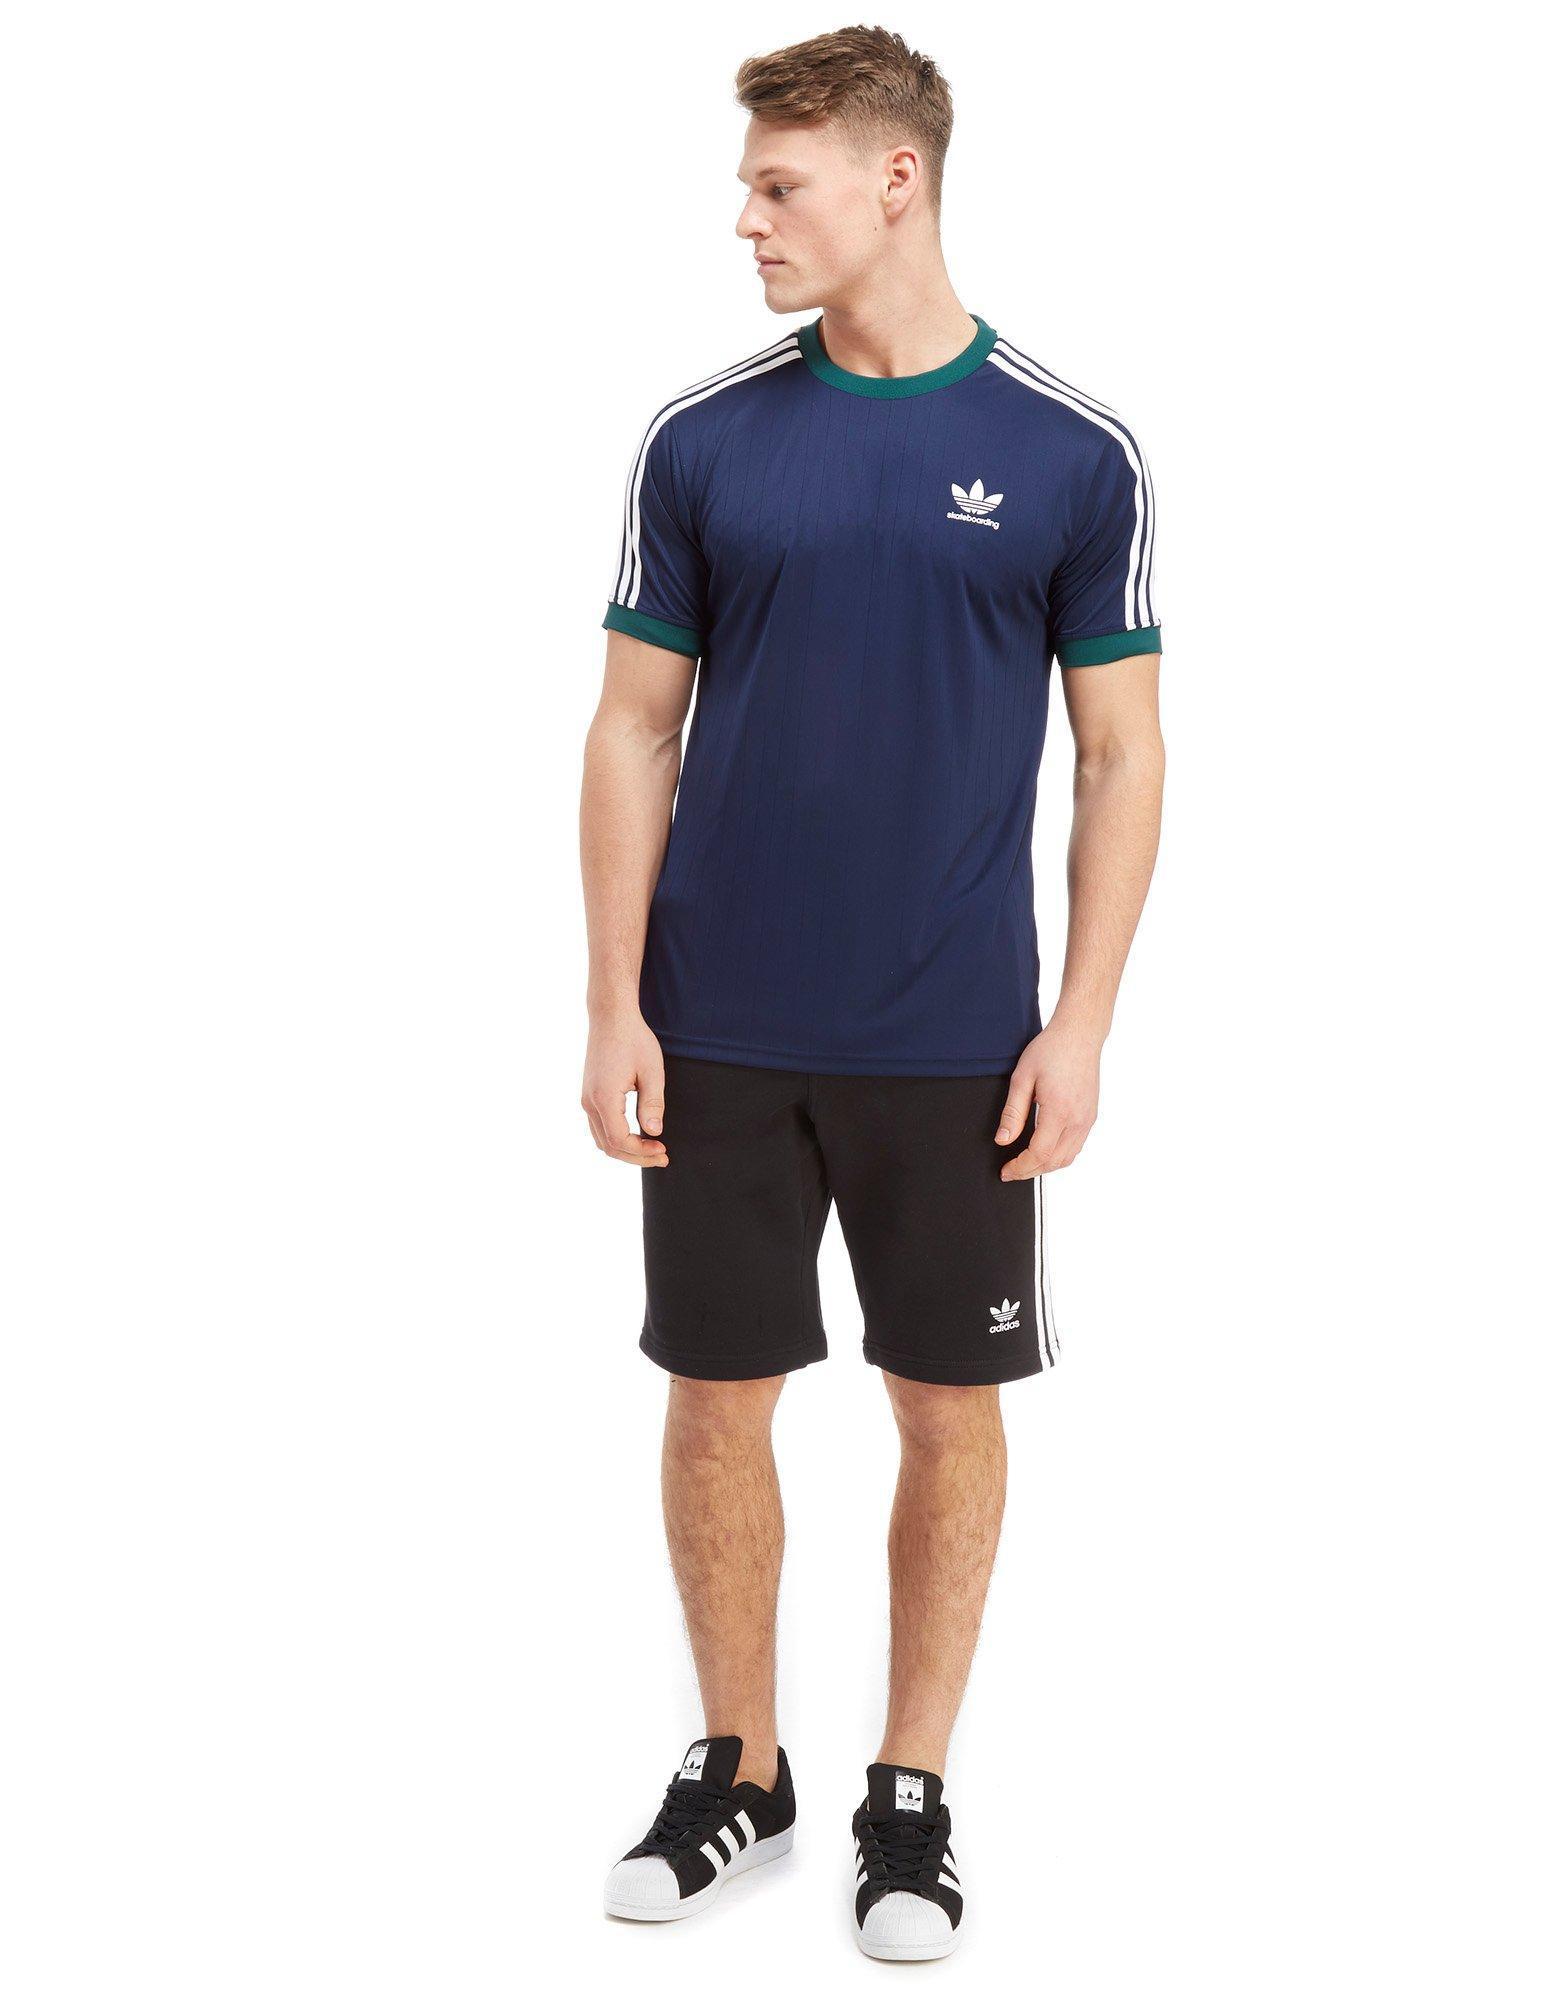 adidas Originals Skateboarding Poly California T shirt in